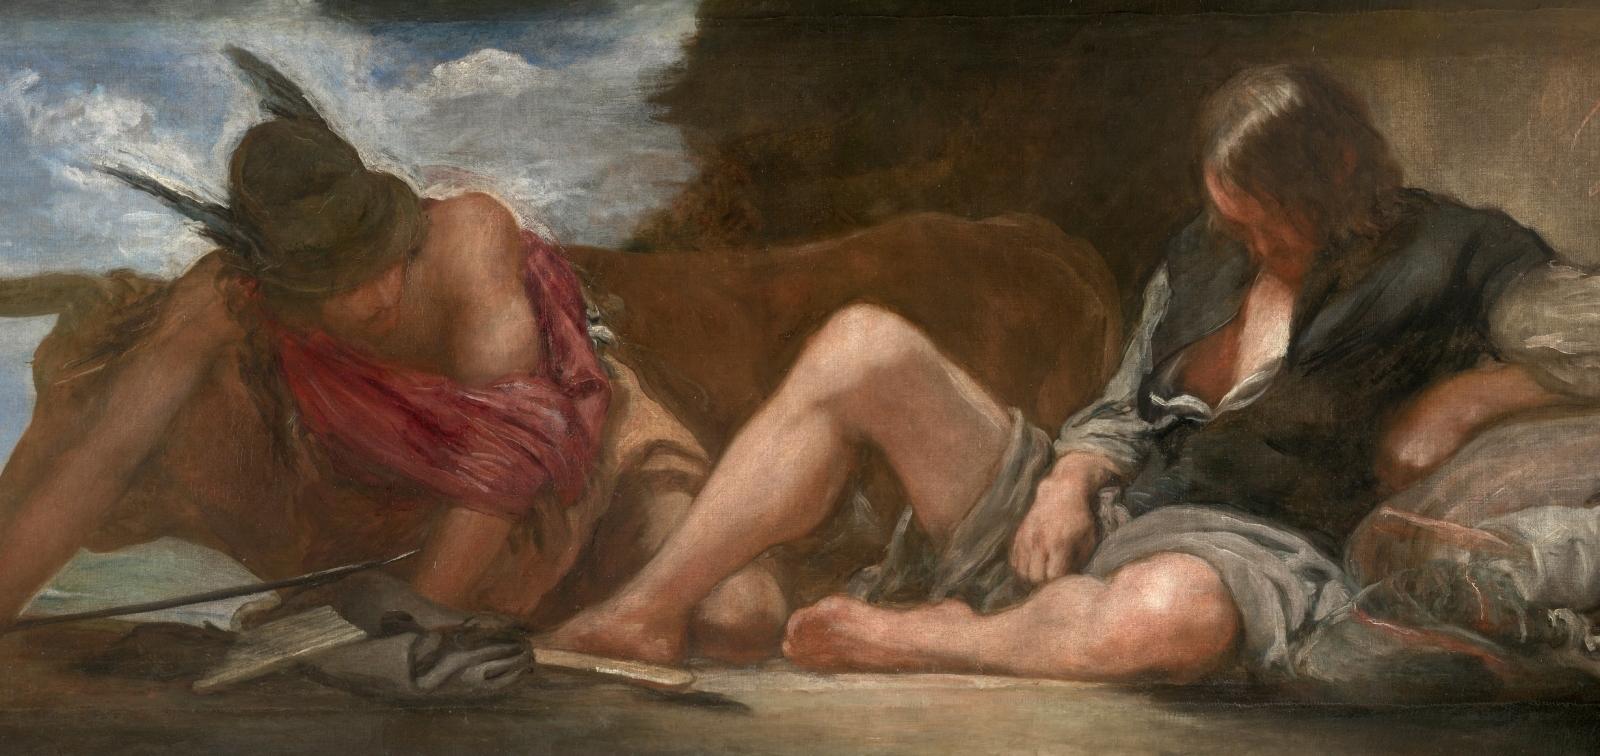 Una obra, un artista: <em>Mercurio y Argos</em>, de Velázquez